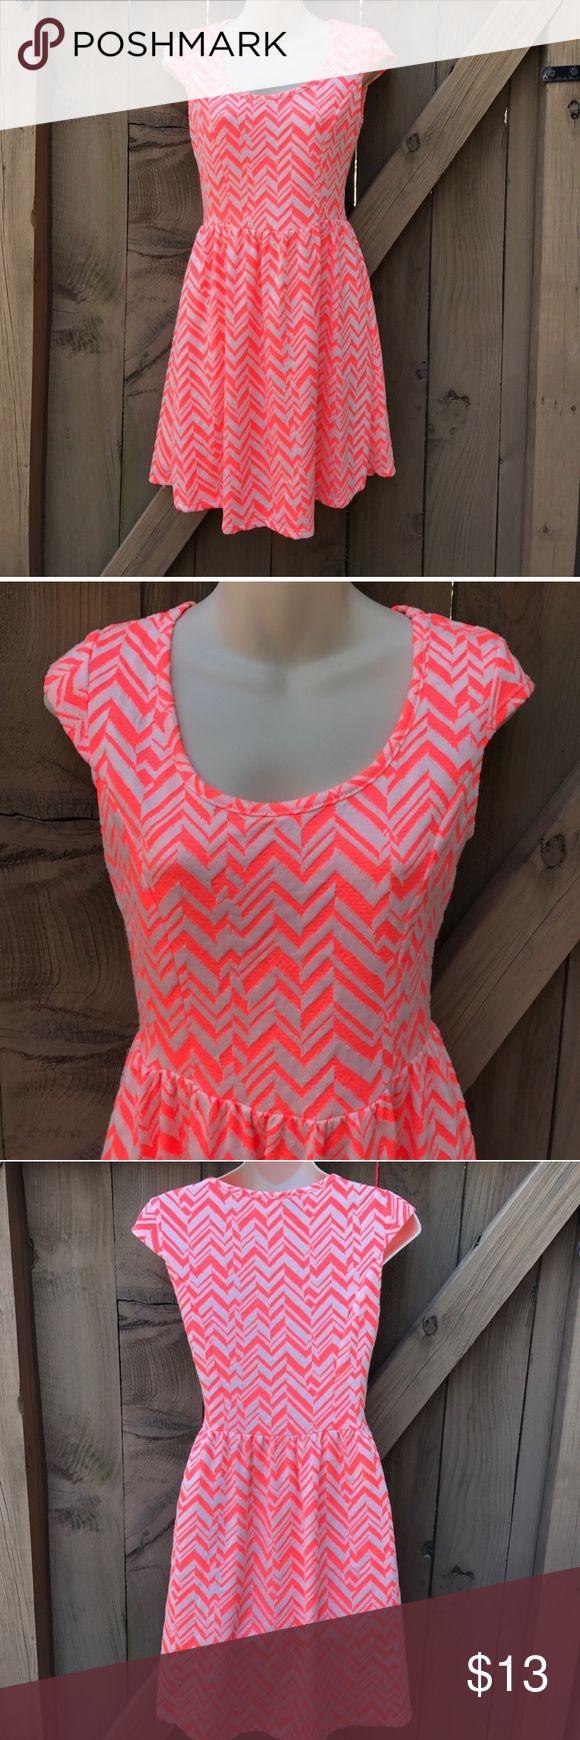 Size M Rue 21 orange chevron cap sleeve dress Size M Rue 21 orange chevron cap sleeve dress Rue 21 Dresses